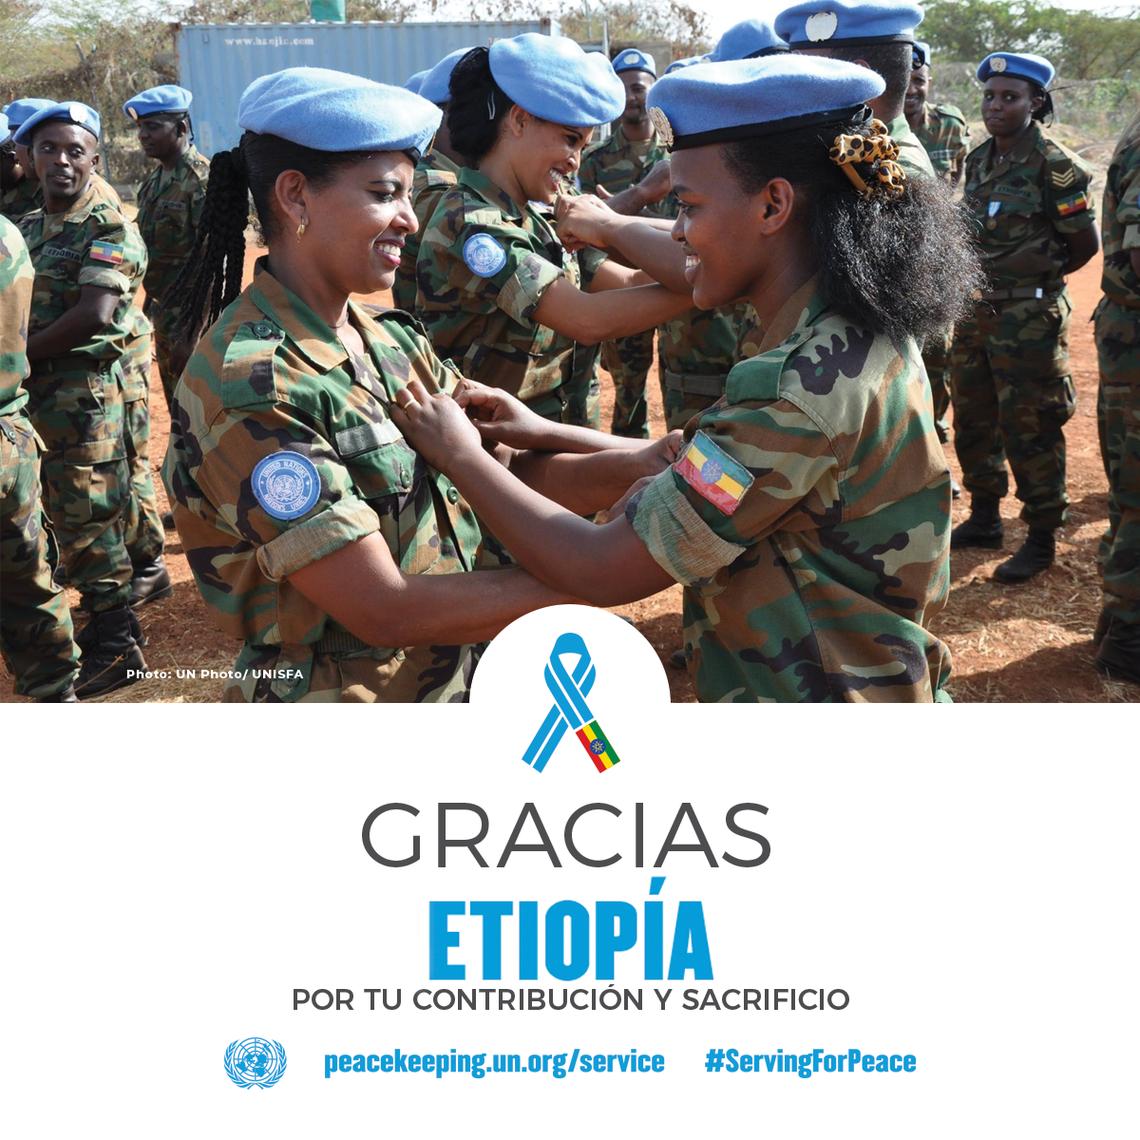 Gracias Etiopía